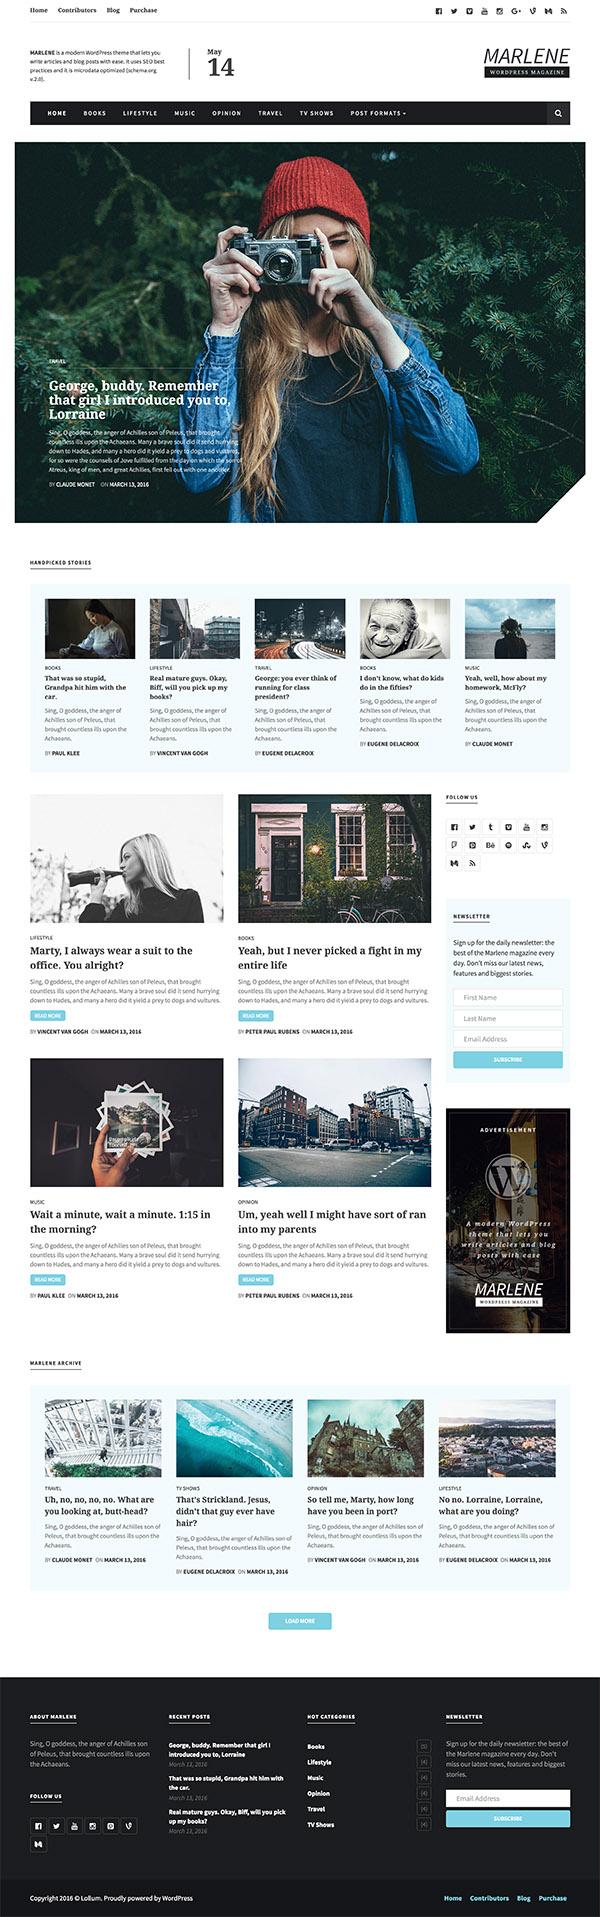 17 Marlene - Magazine and Personal Blog WordPress Theme